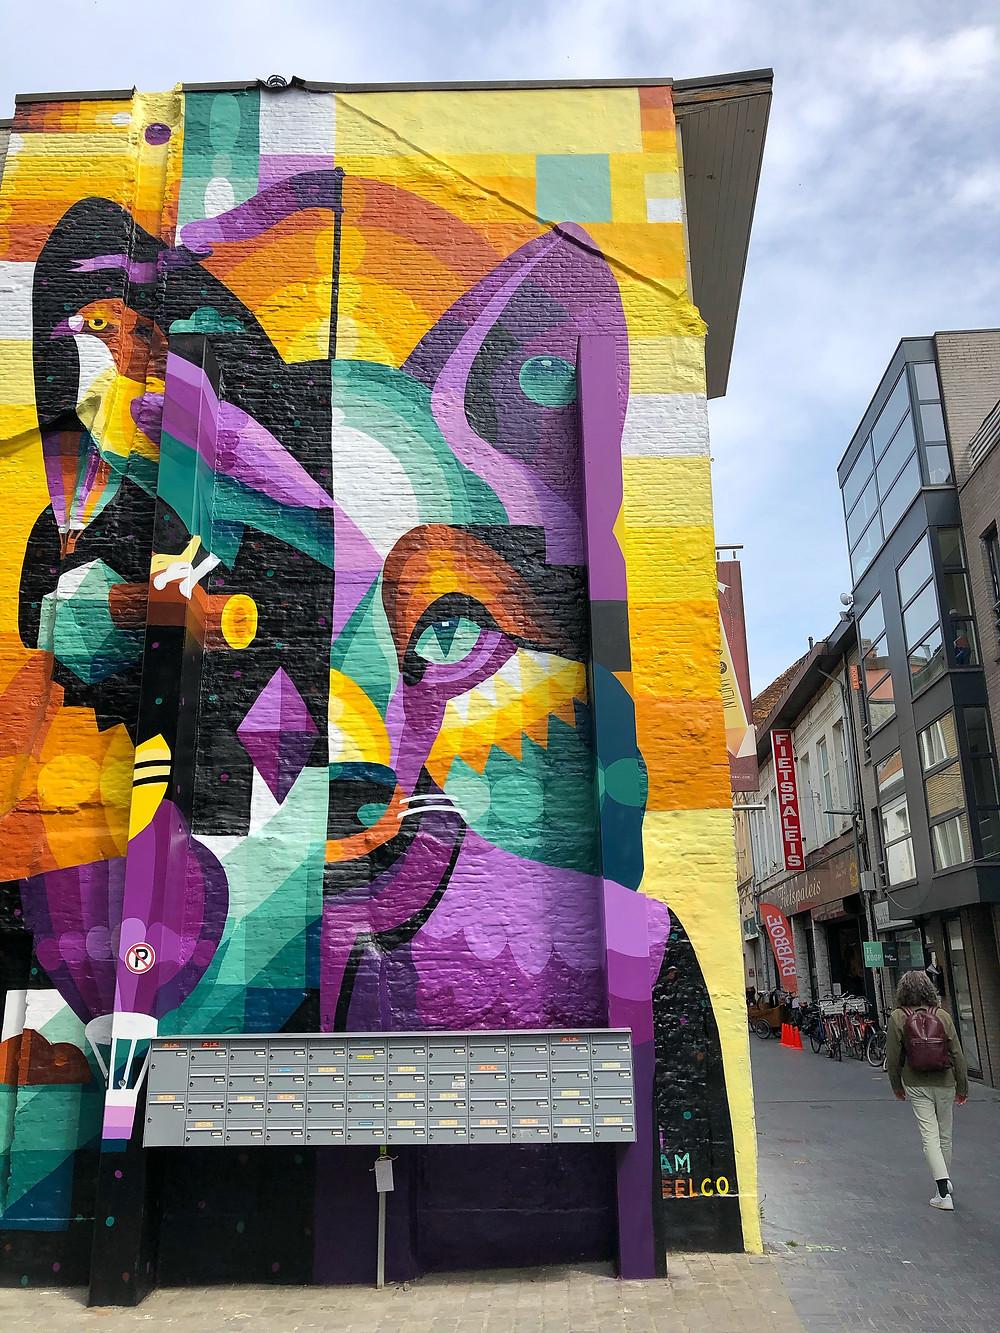 Mural by 'I am Eelco' at Nieuwstraat Sint-Niklaas